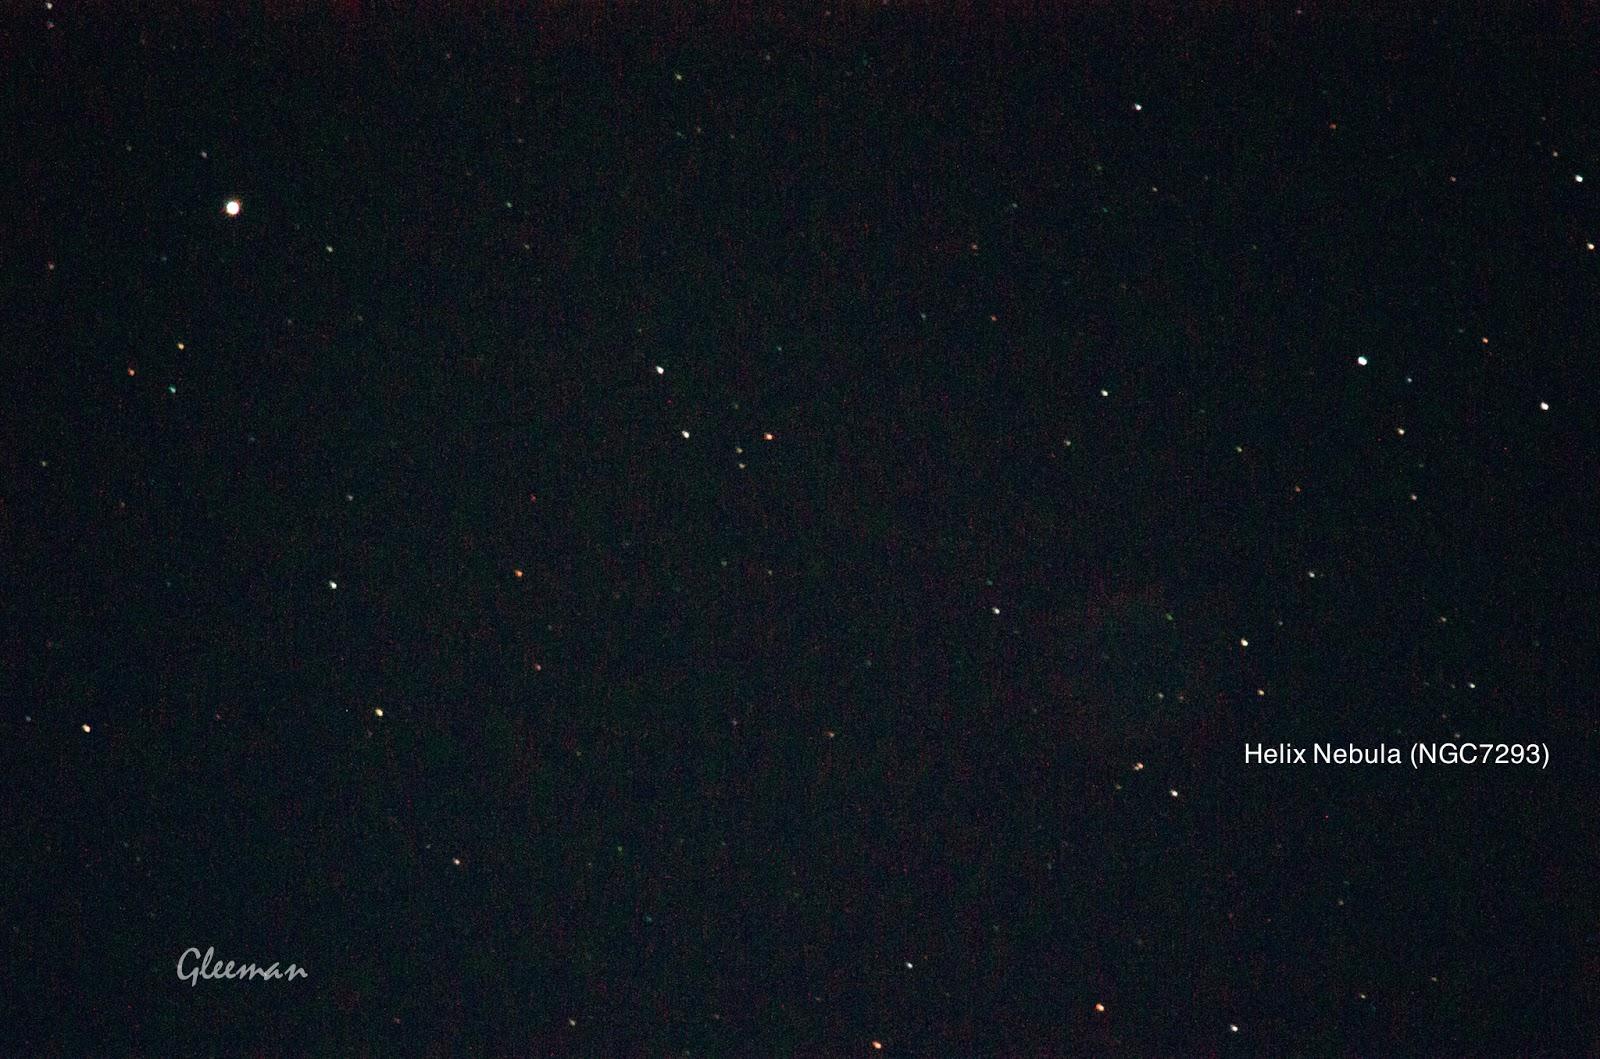 Helix Nebula/ Pentax Pentax 75SDHF + 1.4XL + K5 ,O-GPS1 Astrotracer